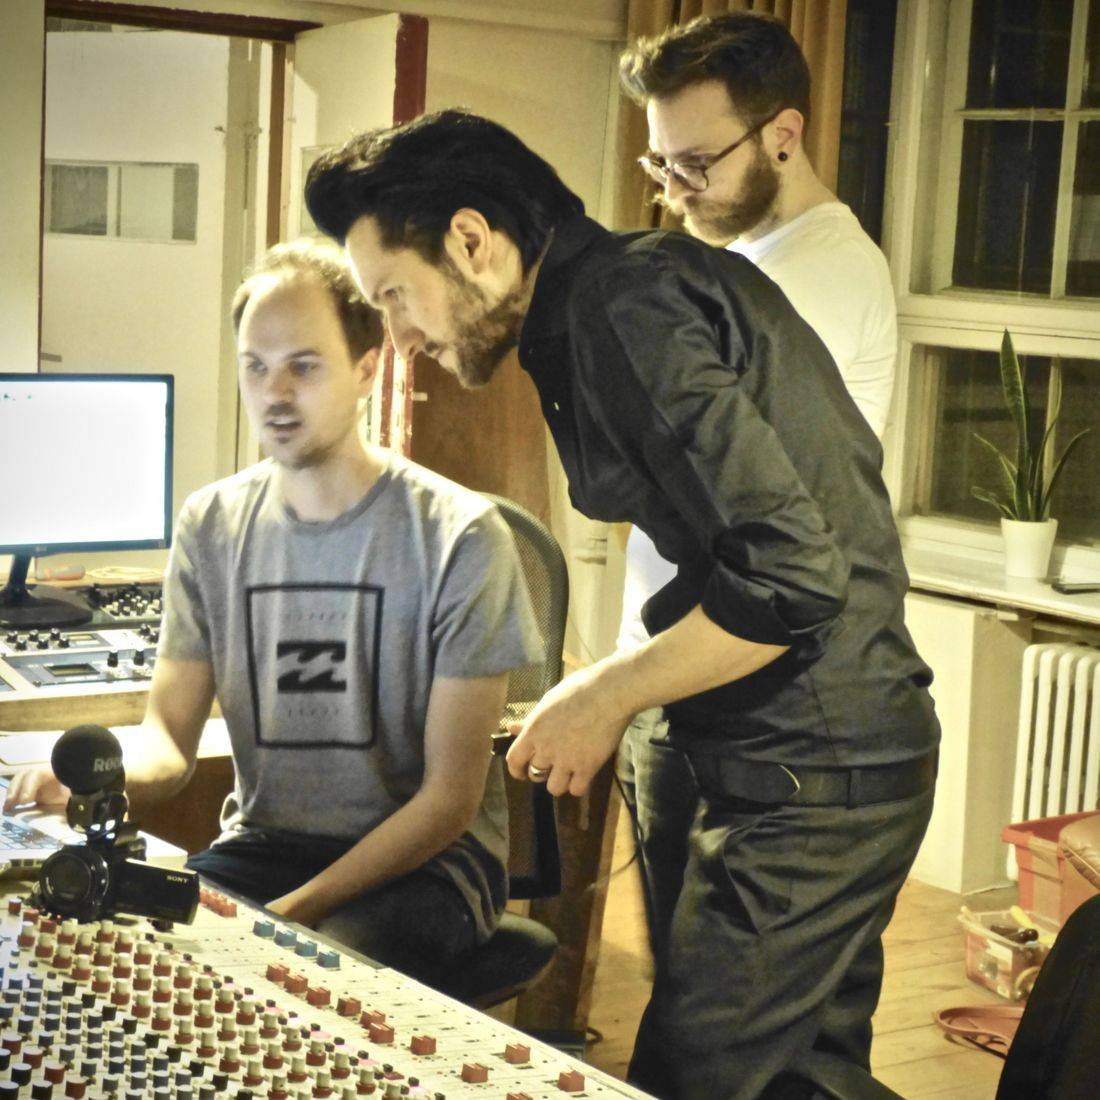 Bakermoon studio Berlin, recording, artist, musician,  poetry, Blake Day